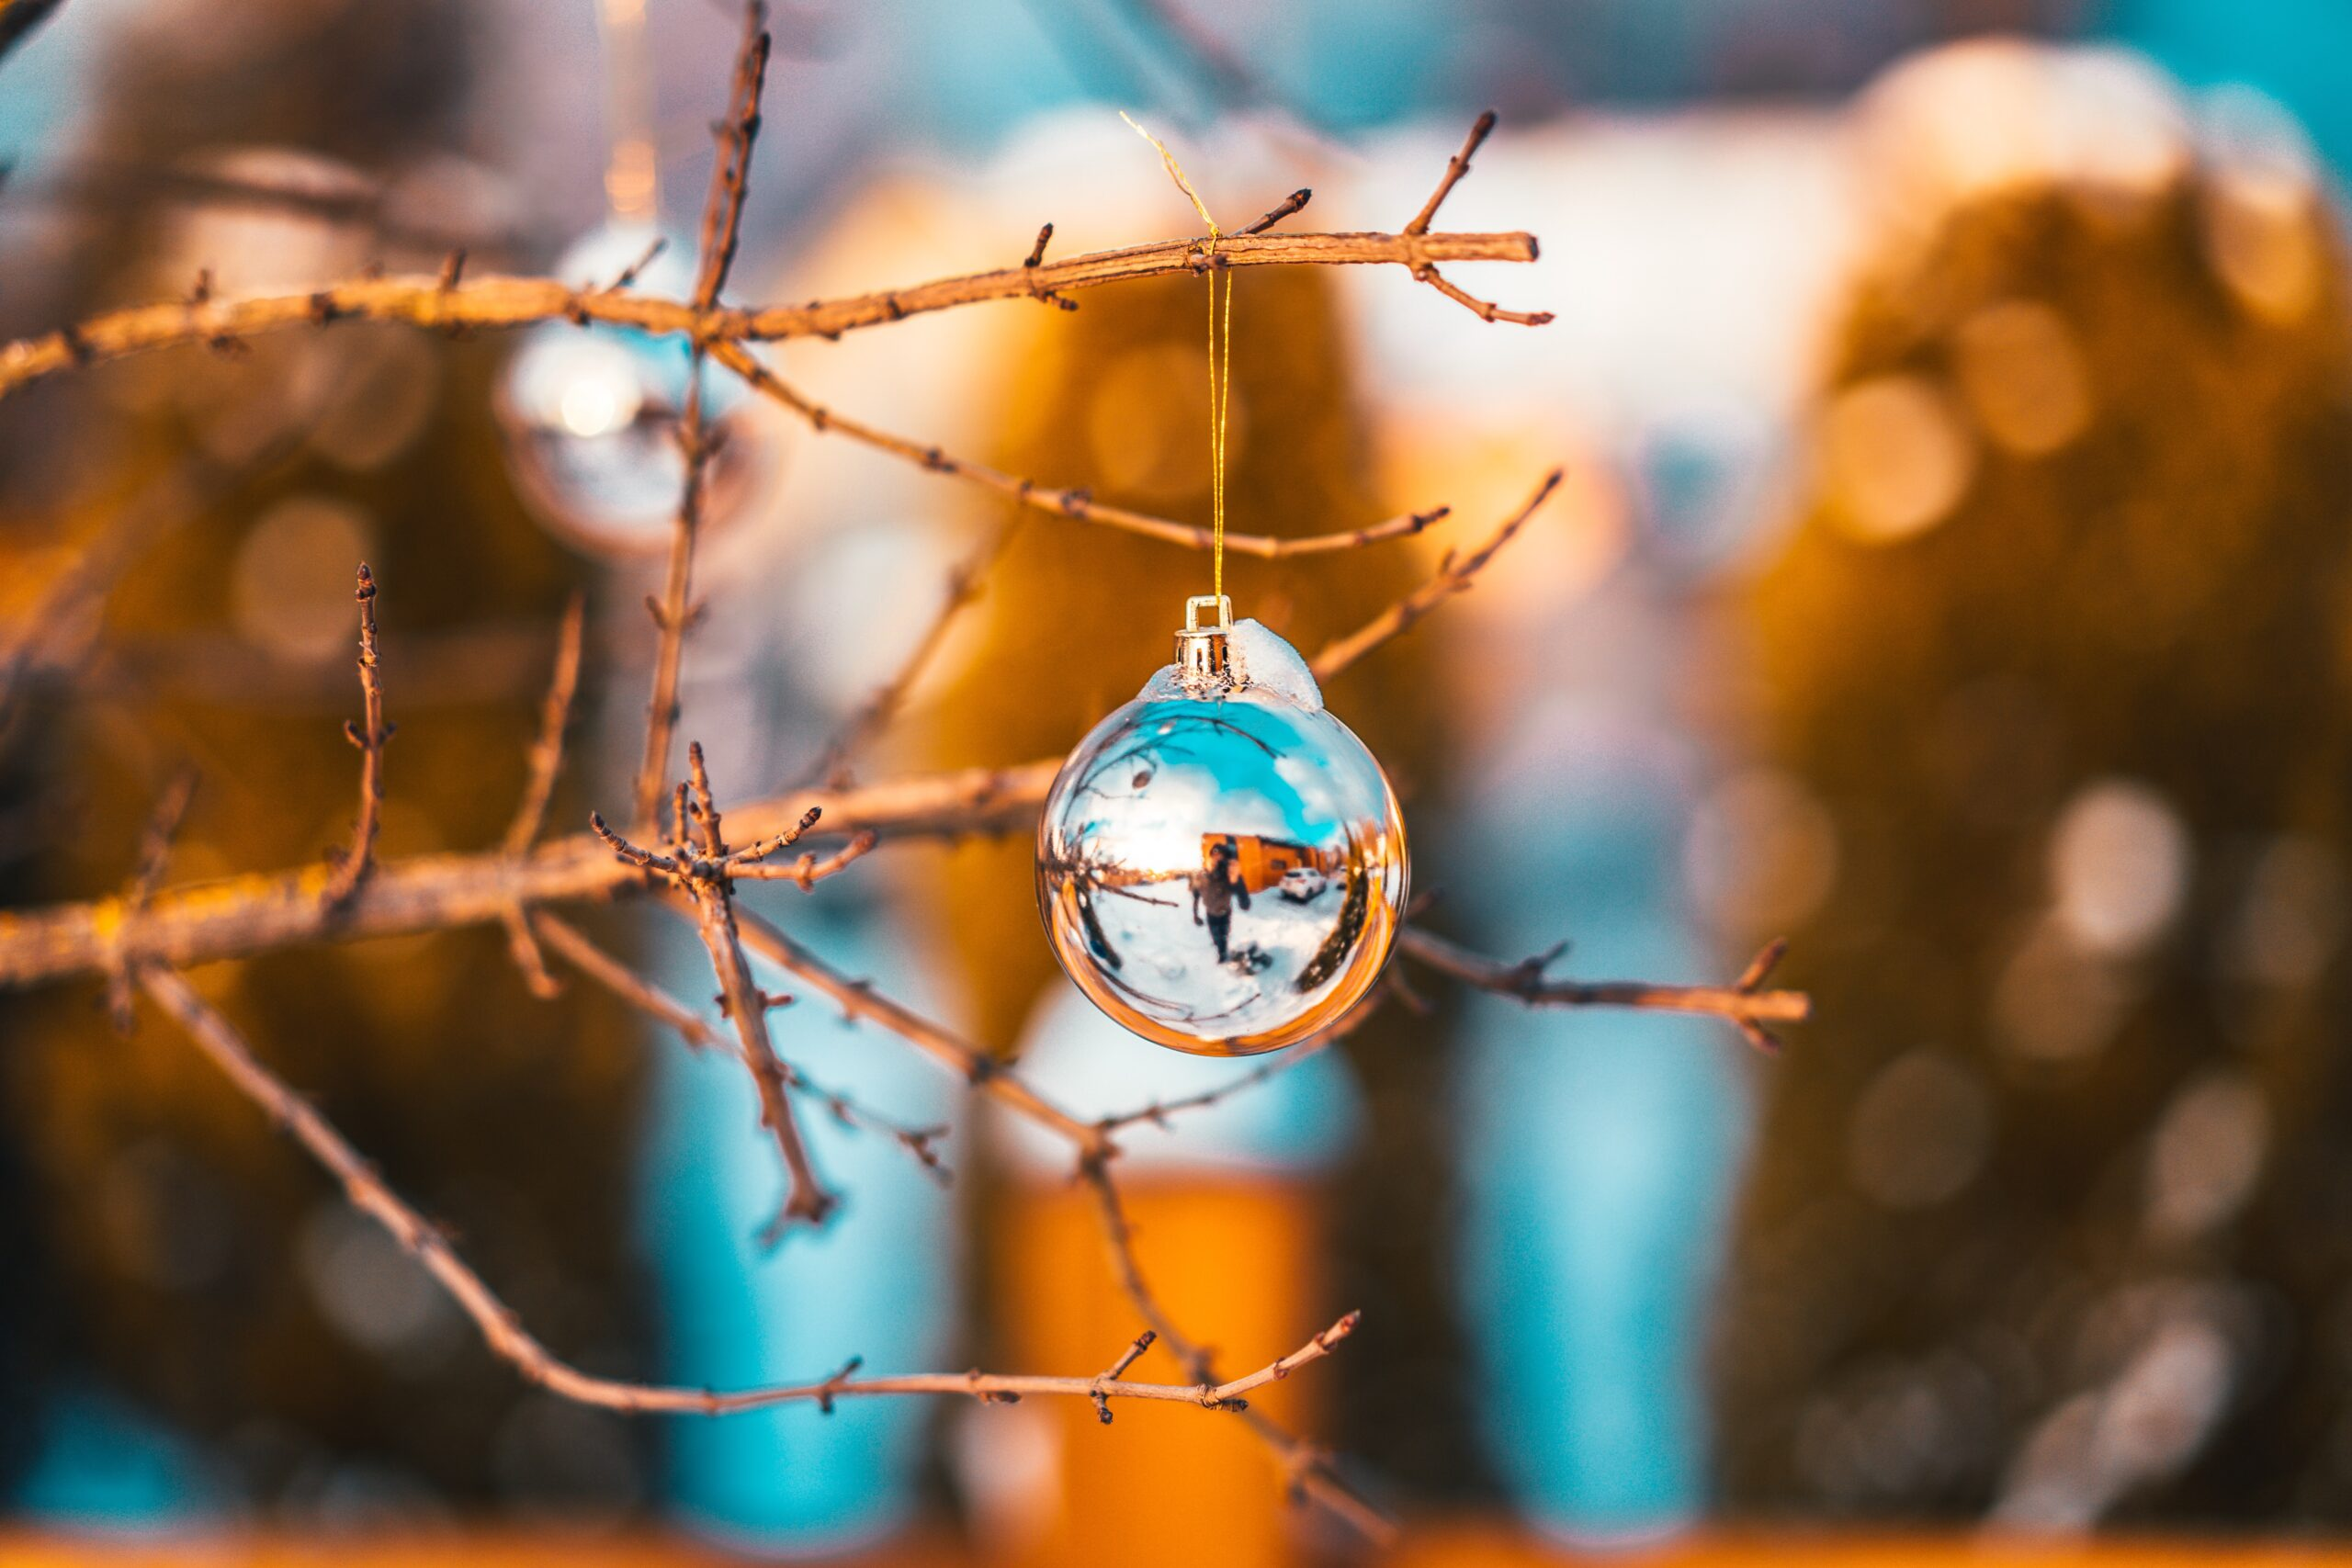 2020 – A Data Christmas Carol